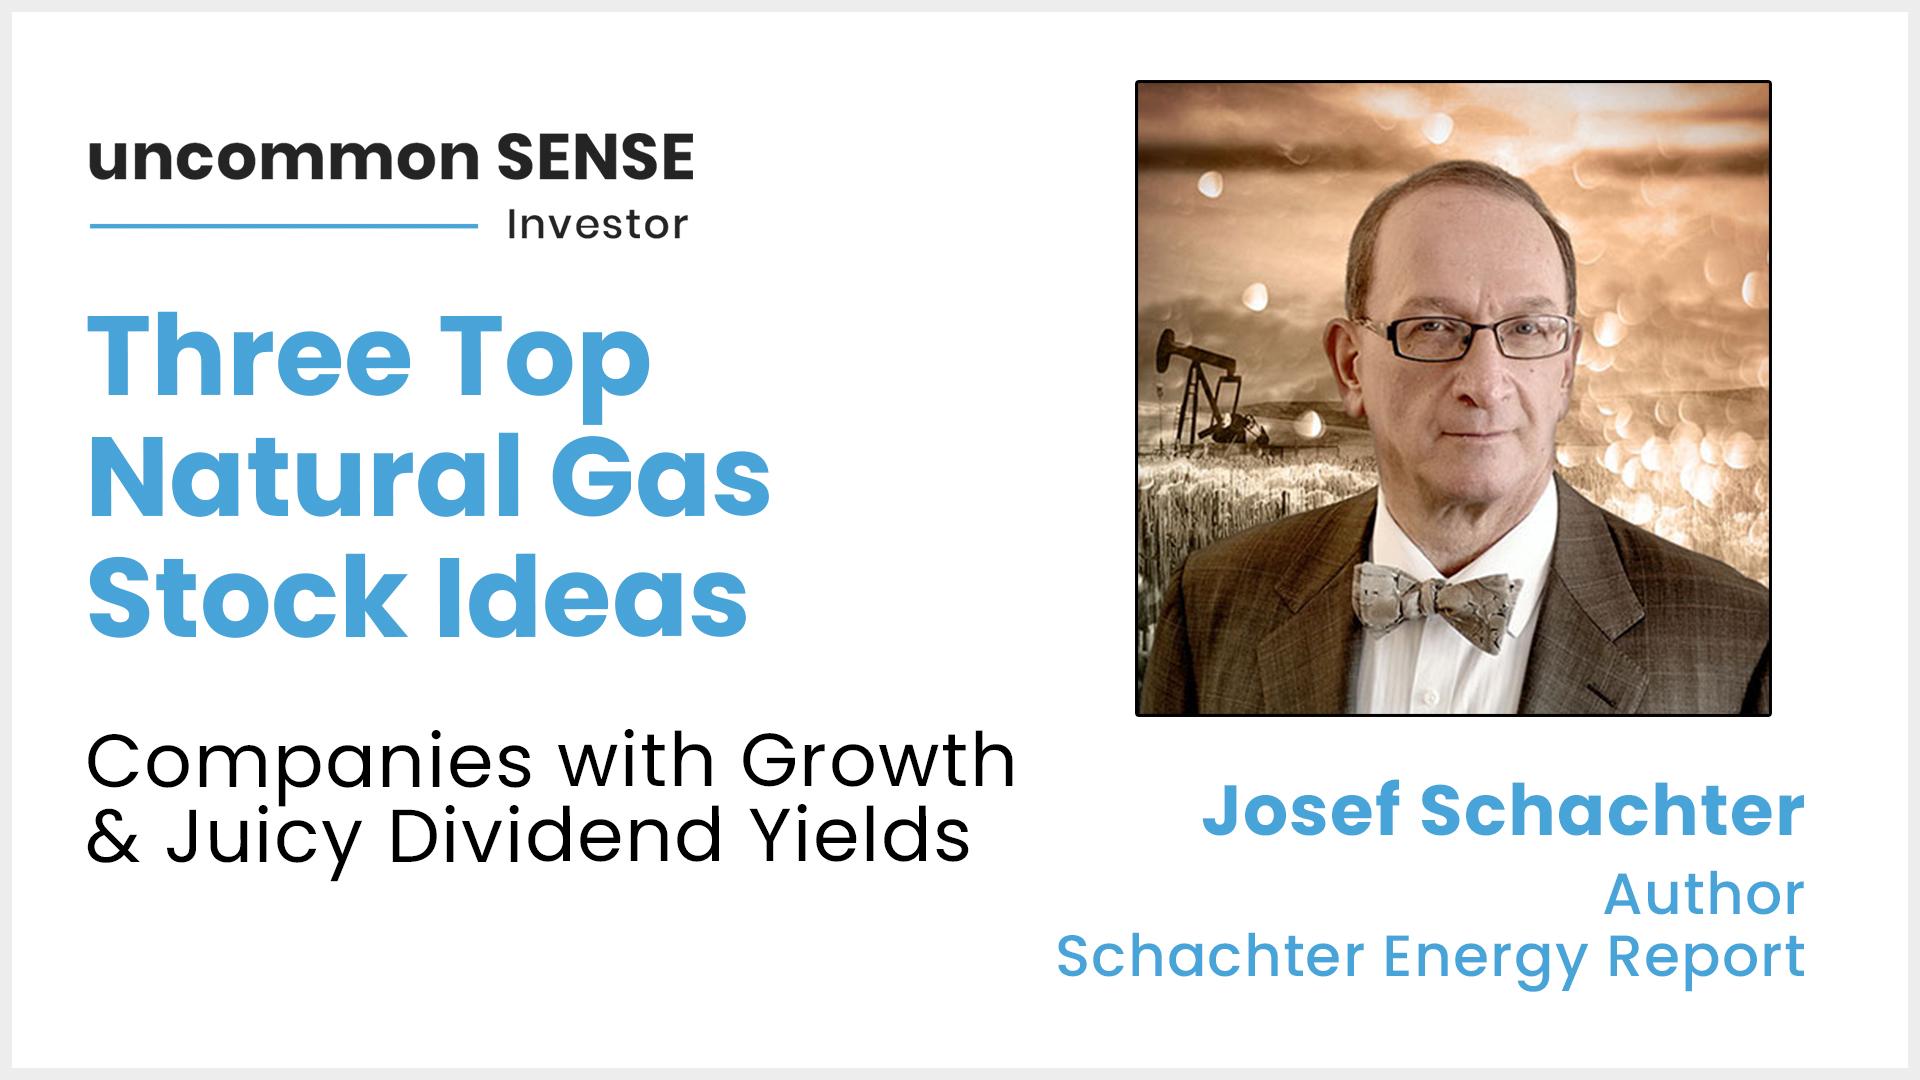 Uncommon Sense Investor - Josef Schachter's Three Top Ideas